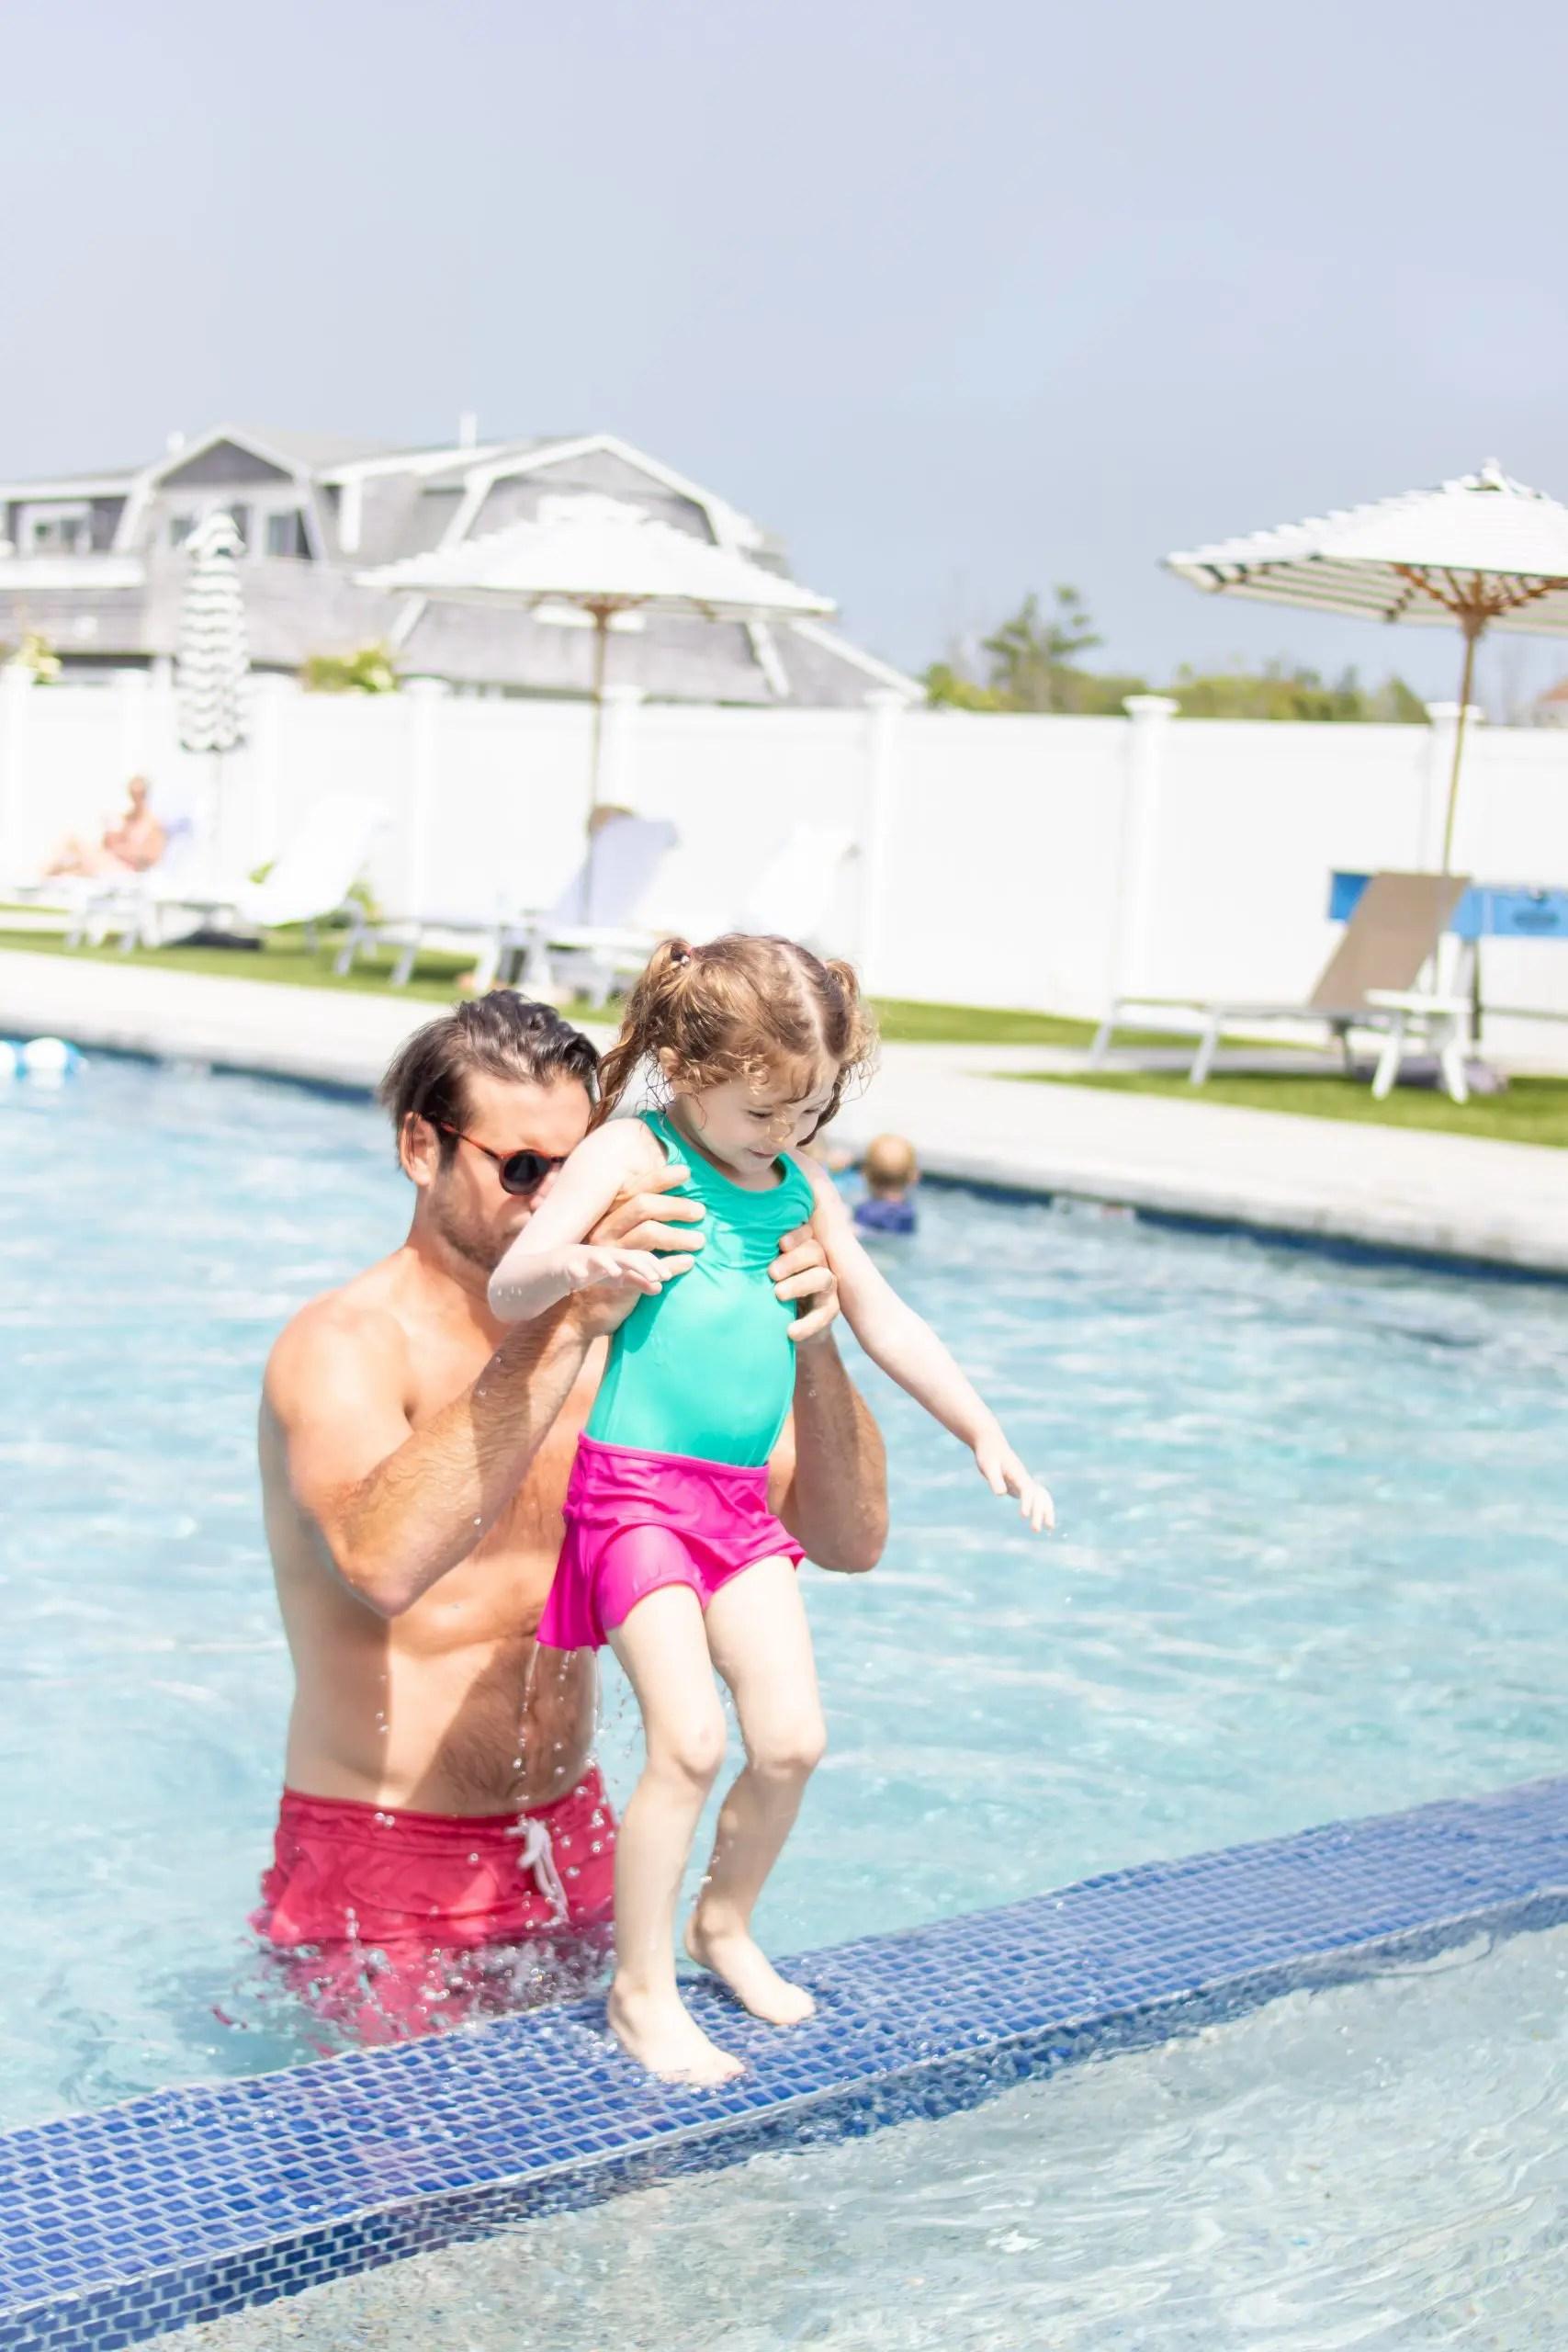 dad and little girl swimming in the pool winnetu